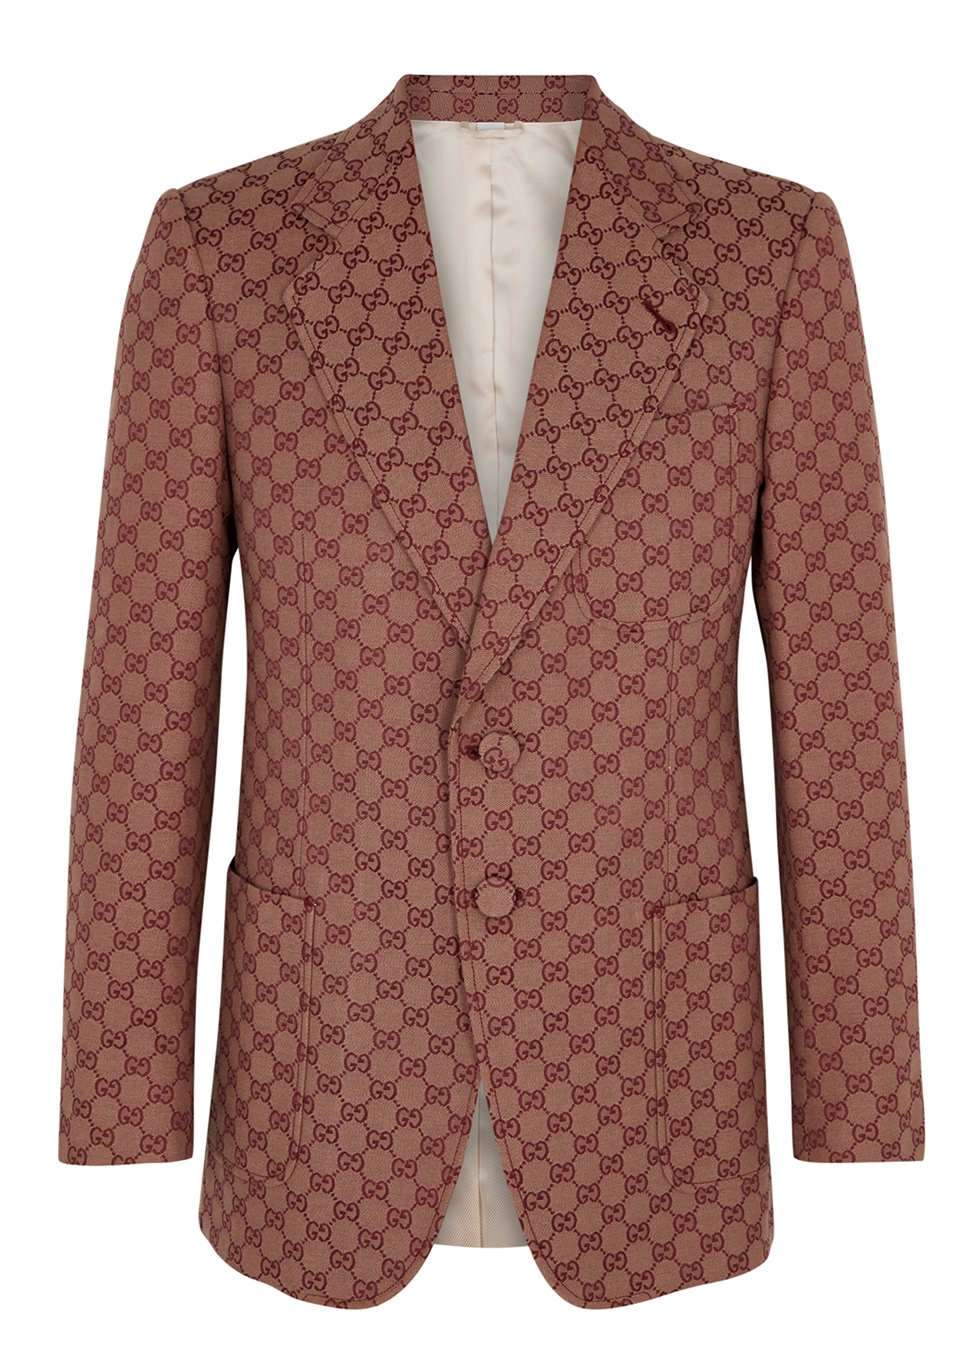 Jackets & Coats Charitable 2018 New Winter Blazer Fur Collar Long Section Men Fur Coat Mens Business Casual Leather Jacket Fleece Warm Thick Overcoat Xxxl